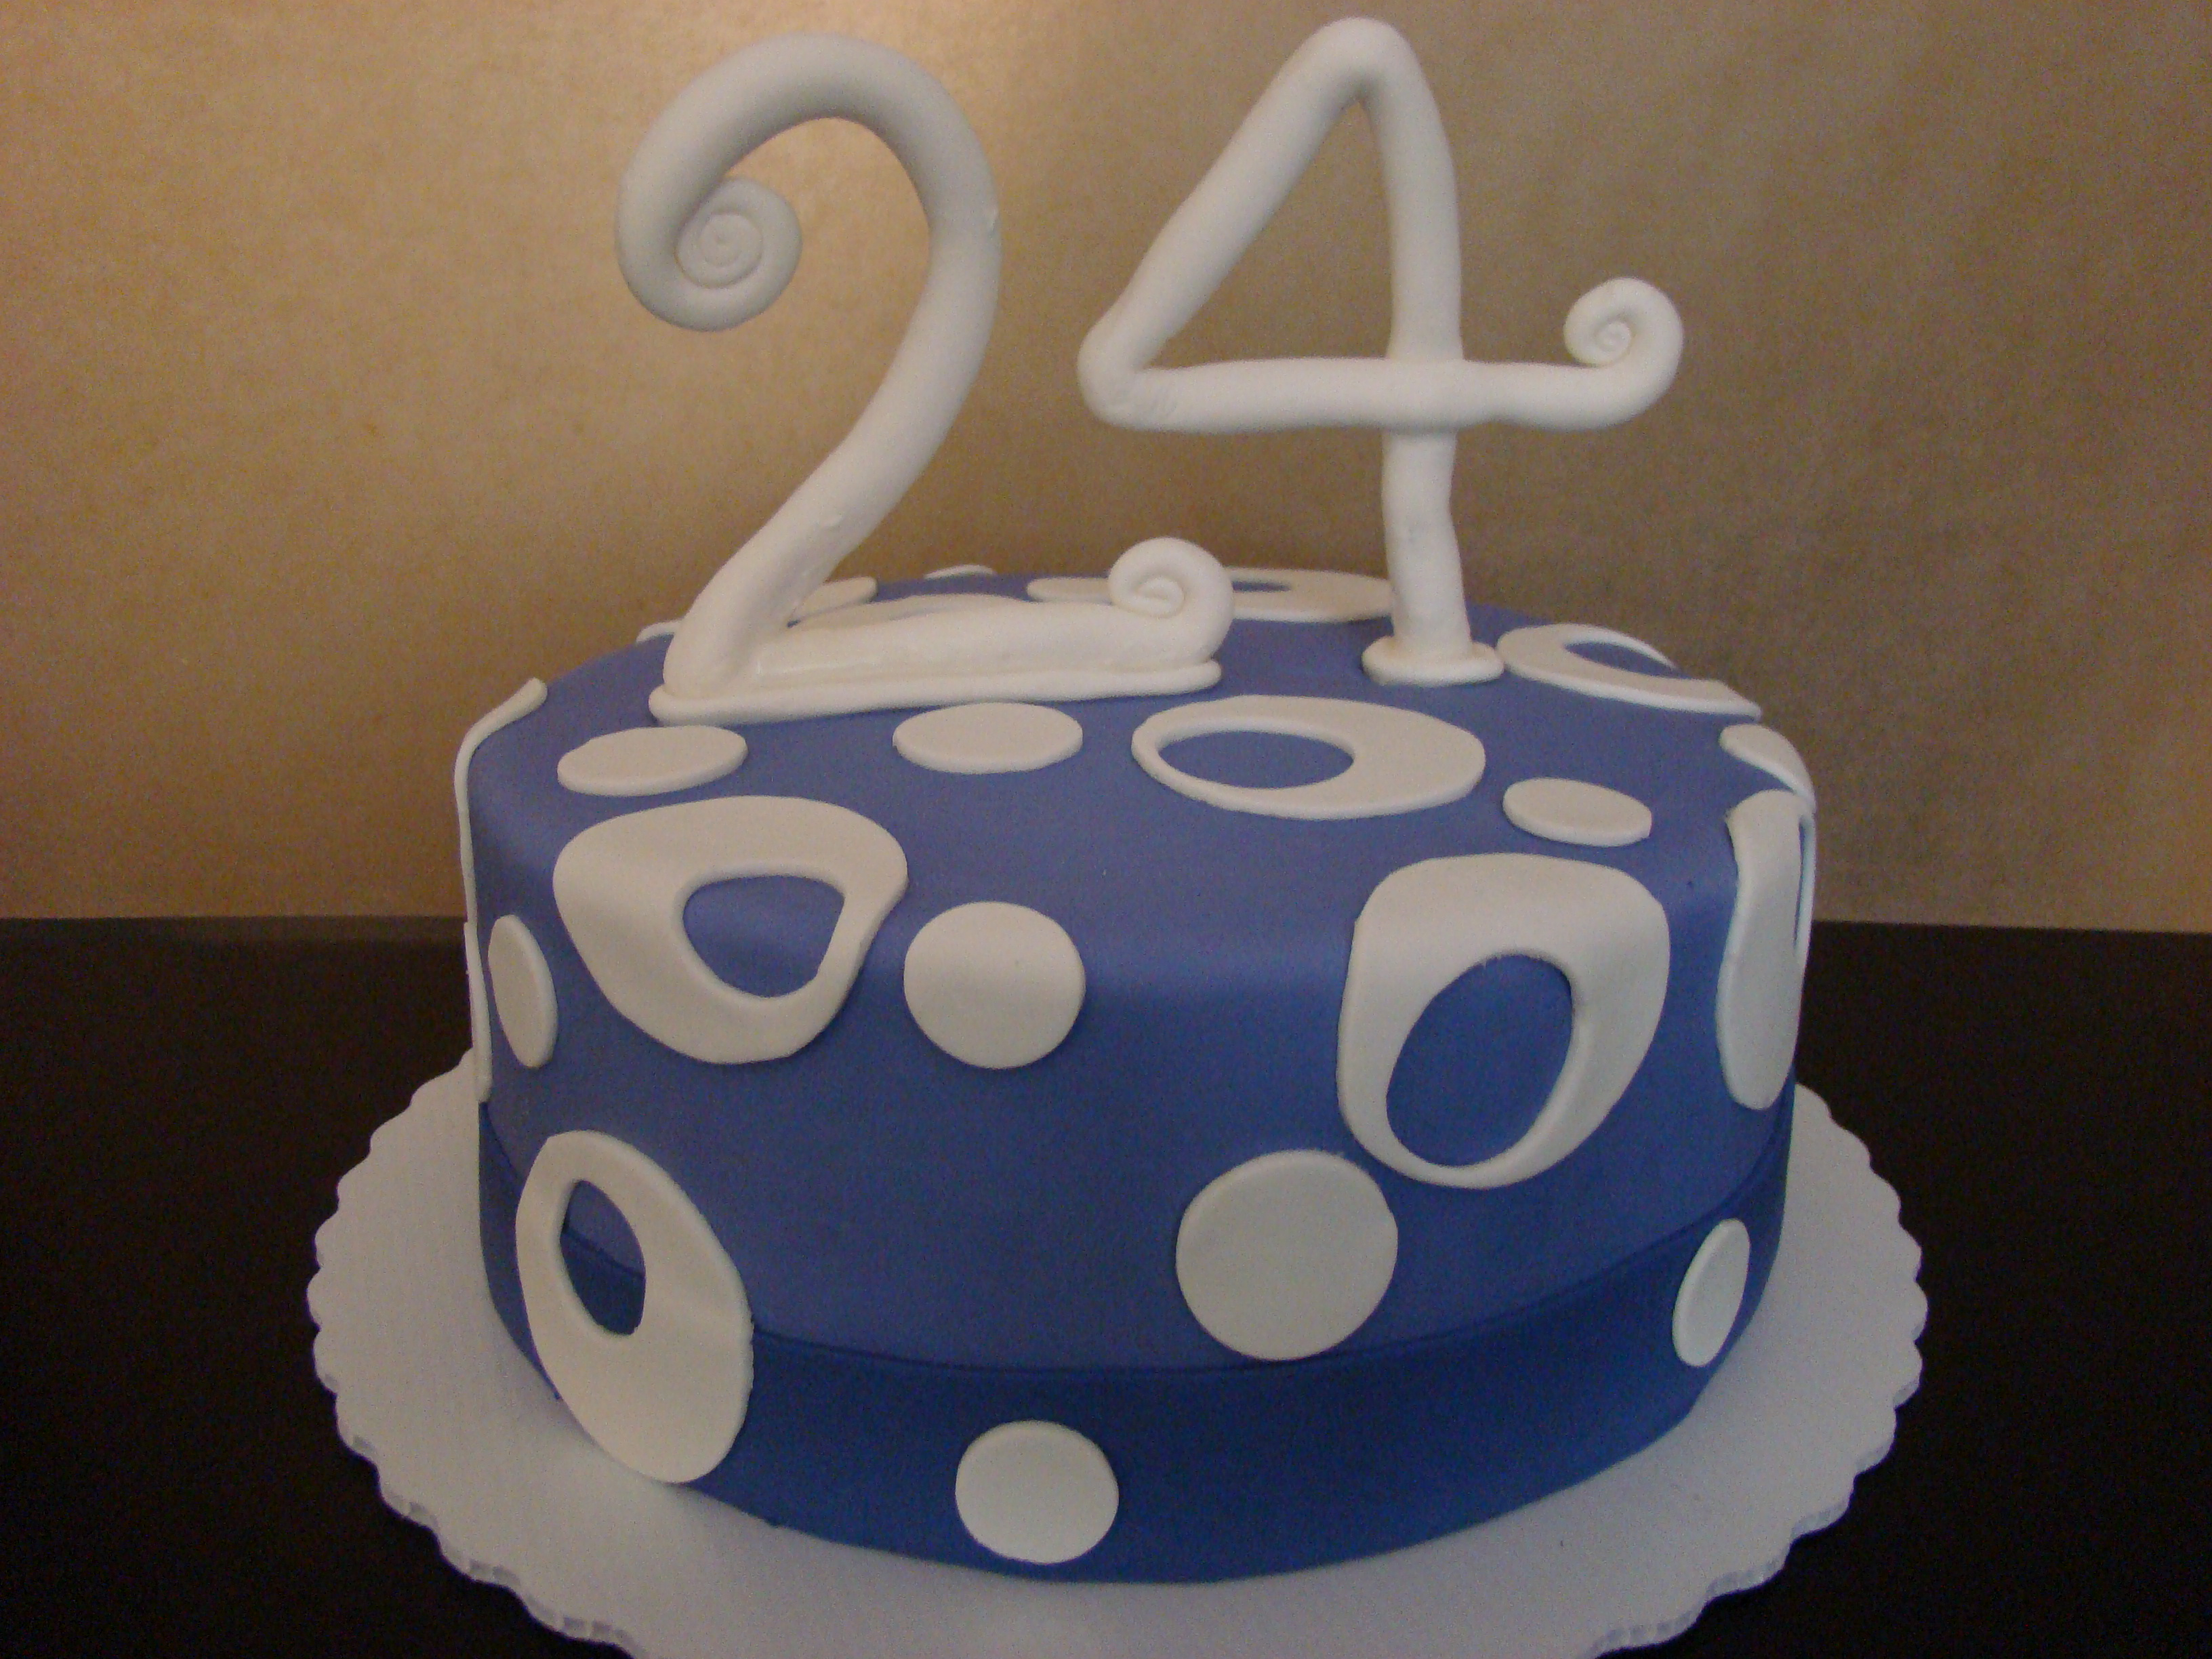 10 24 Birthday Cakes For Your Birthday Photo 24 Birthday Cake With